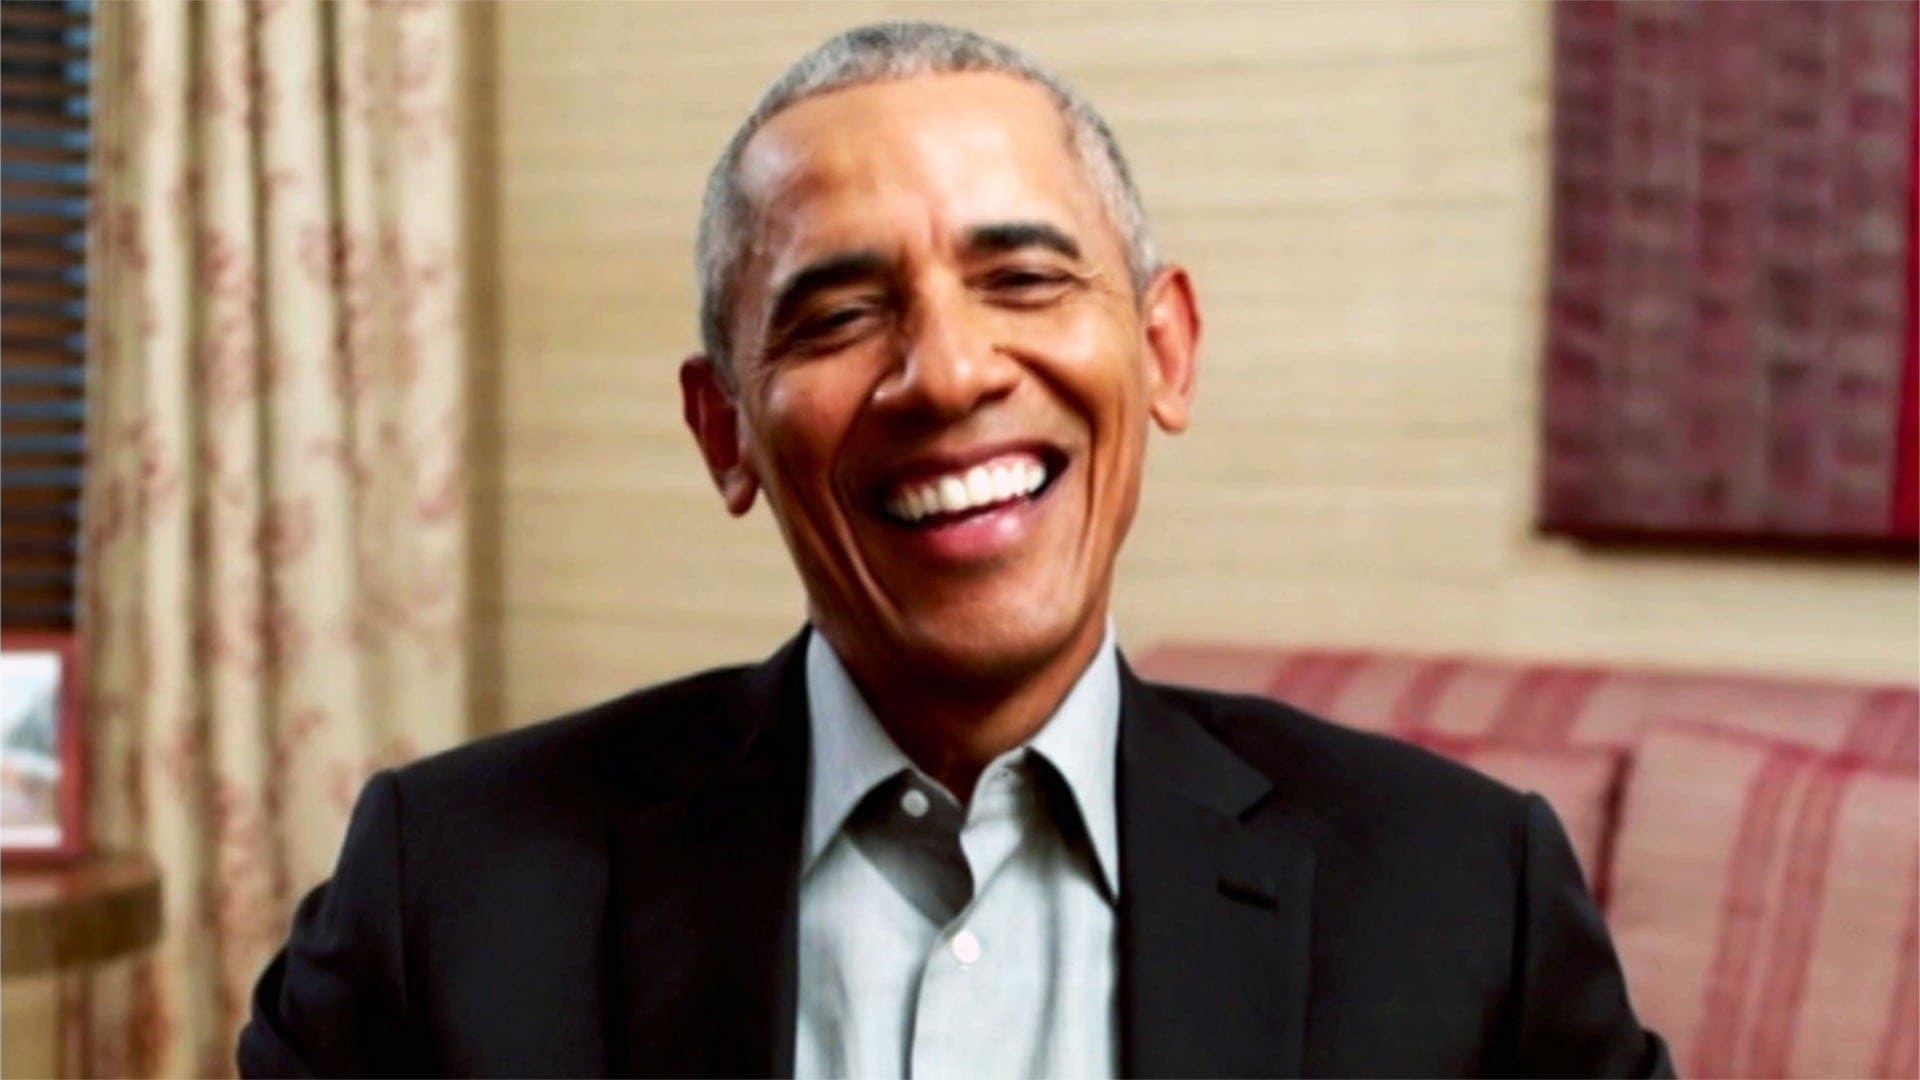 Barack Obama; Liam Gallagher